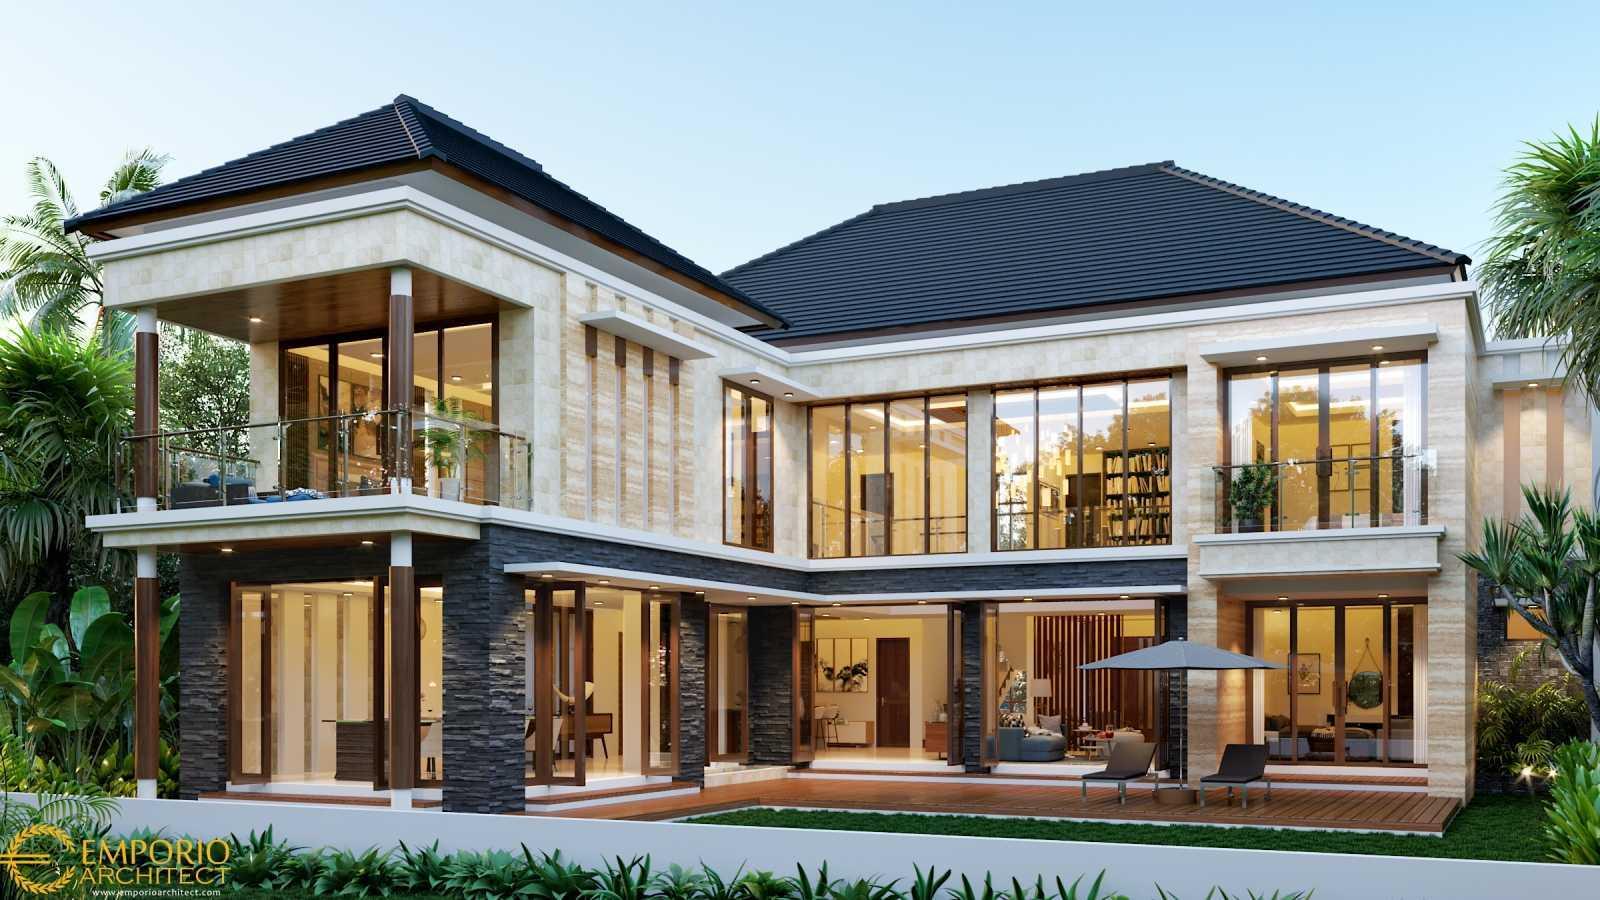 Emporio Architect Desain Rumah Modern Tropis 541 @ Sulawesi Sulawesi, Indonesia Sulawesi, Indonesia Emporio-Architect-Desain-Rumah-Modern-Tropis-541-Sulawesi  78185